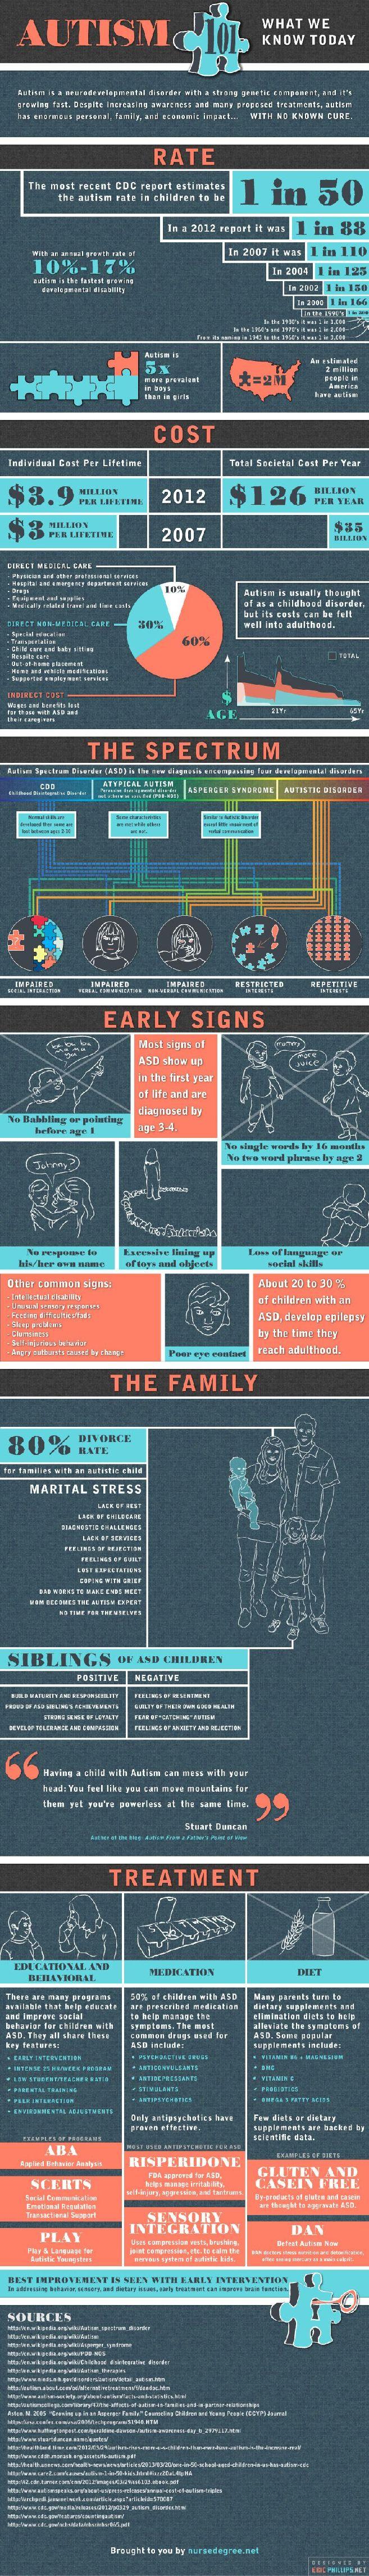 Autism Spectrum Disorder 101-Infographic